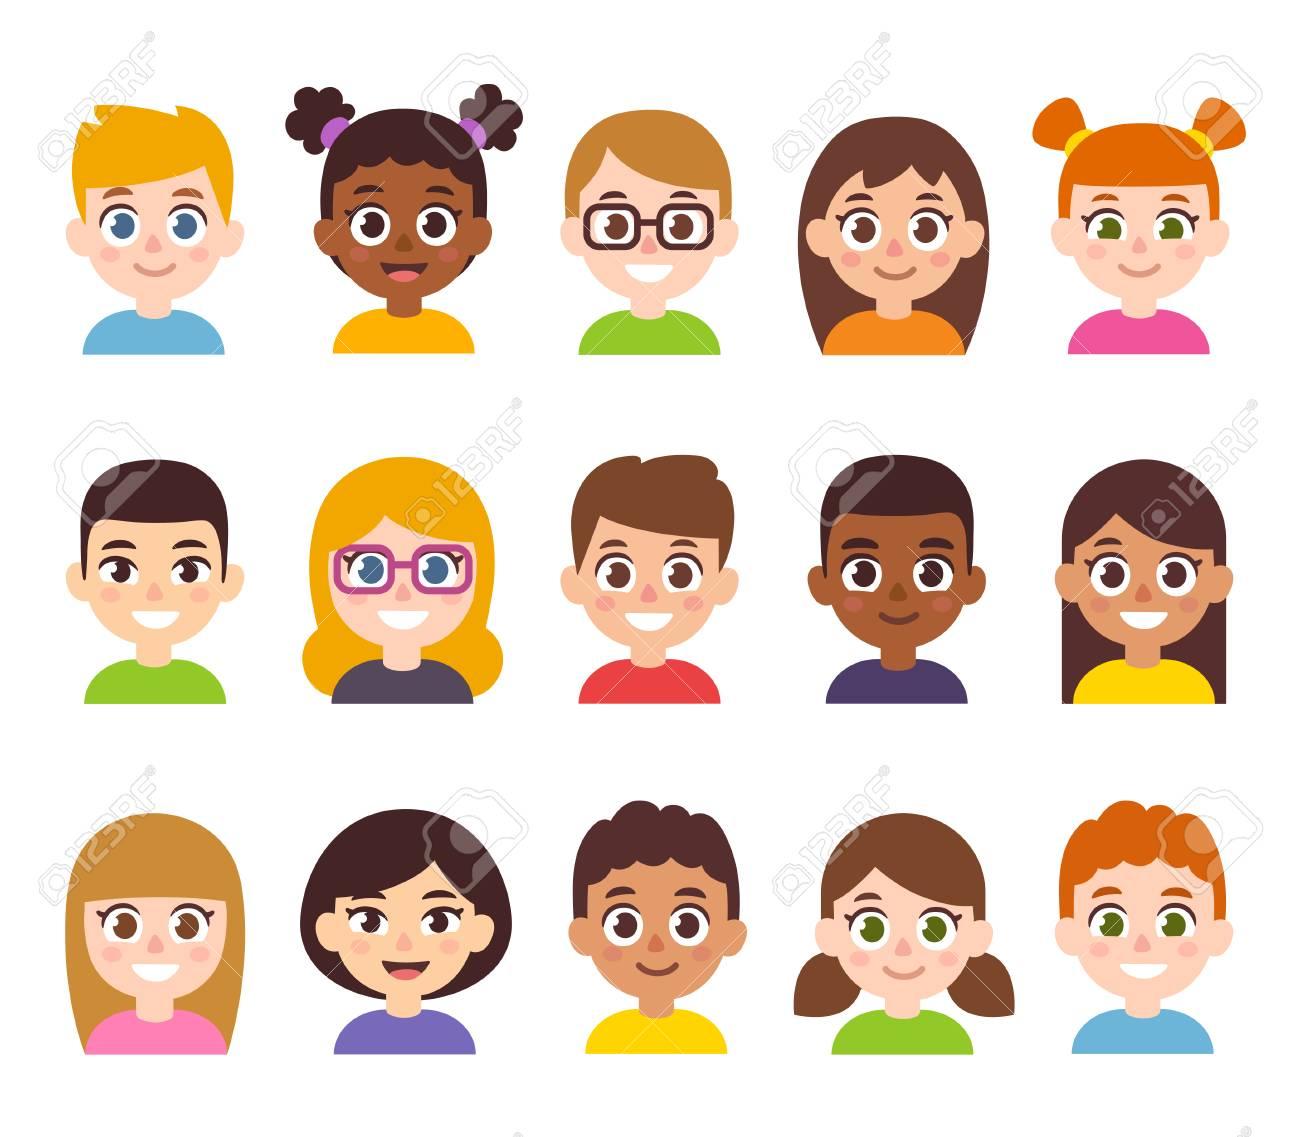 hight resolution of cartoon children avatar set cute diverse kids faces vector clipart illustration stock vector